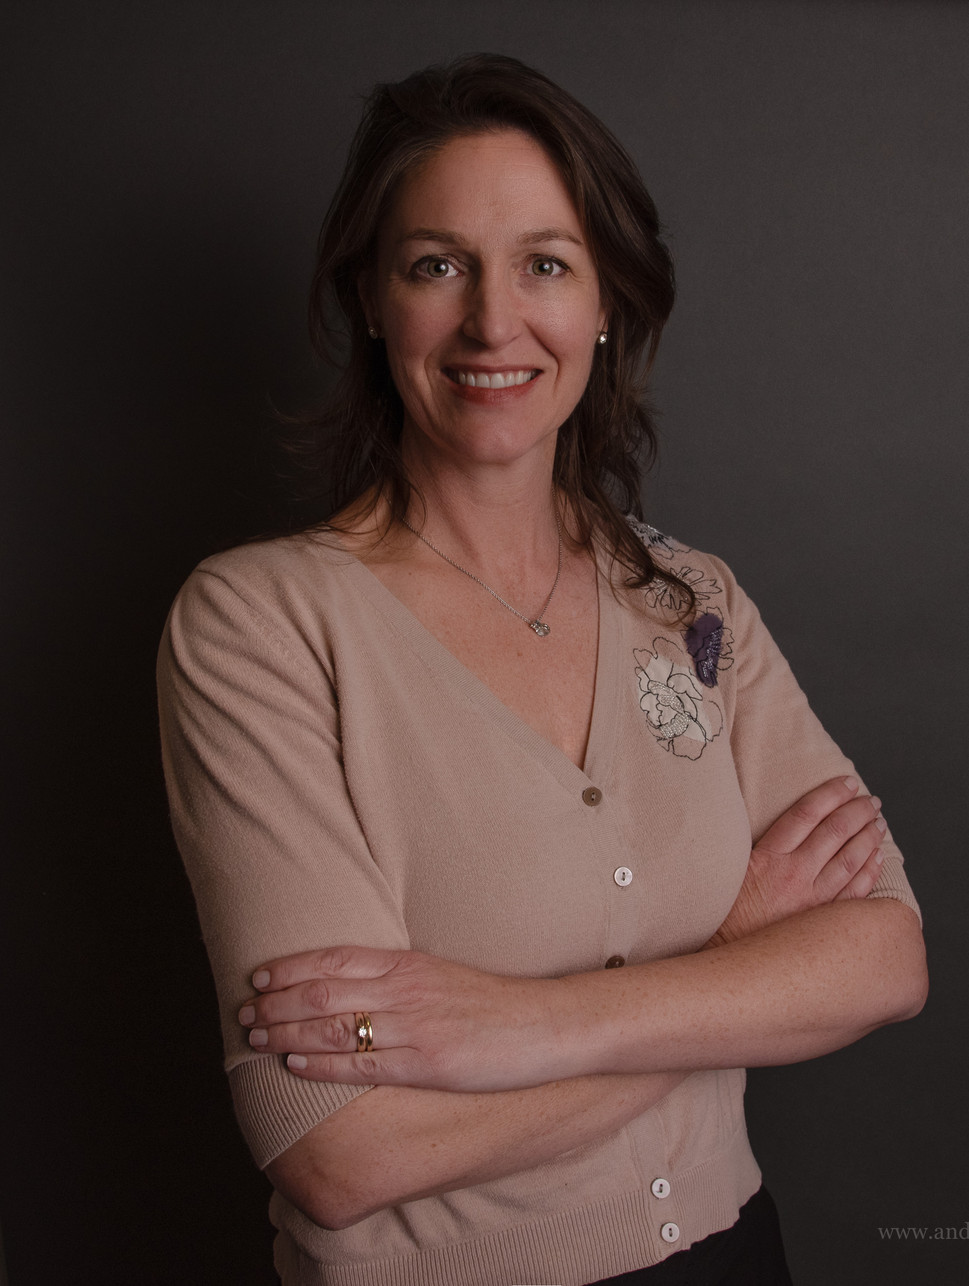 Headshot - WIL Women in Leadership